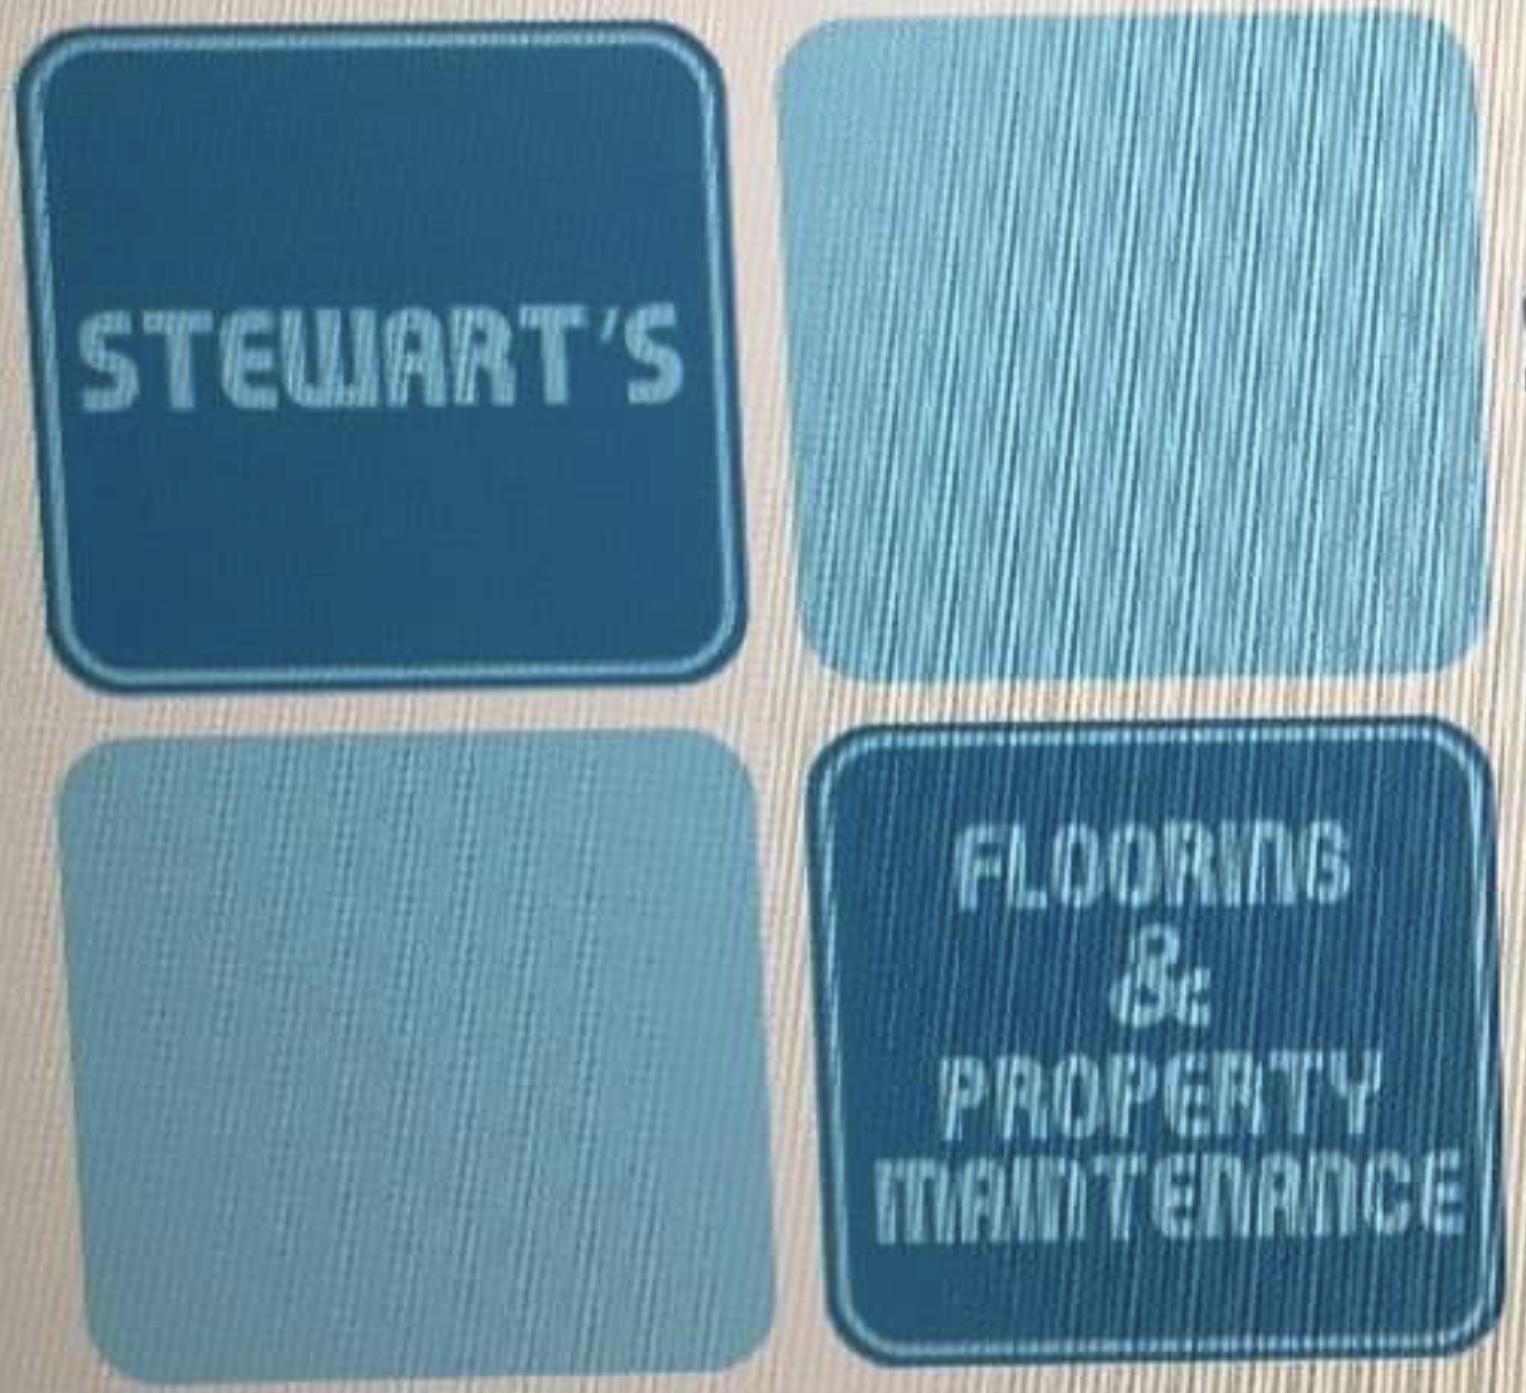 Stewarts Flooring and Property Maintenance Verified Logo